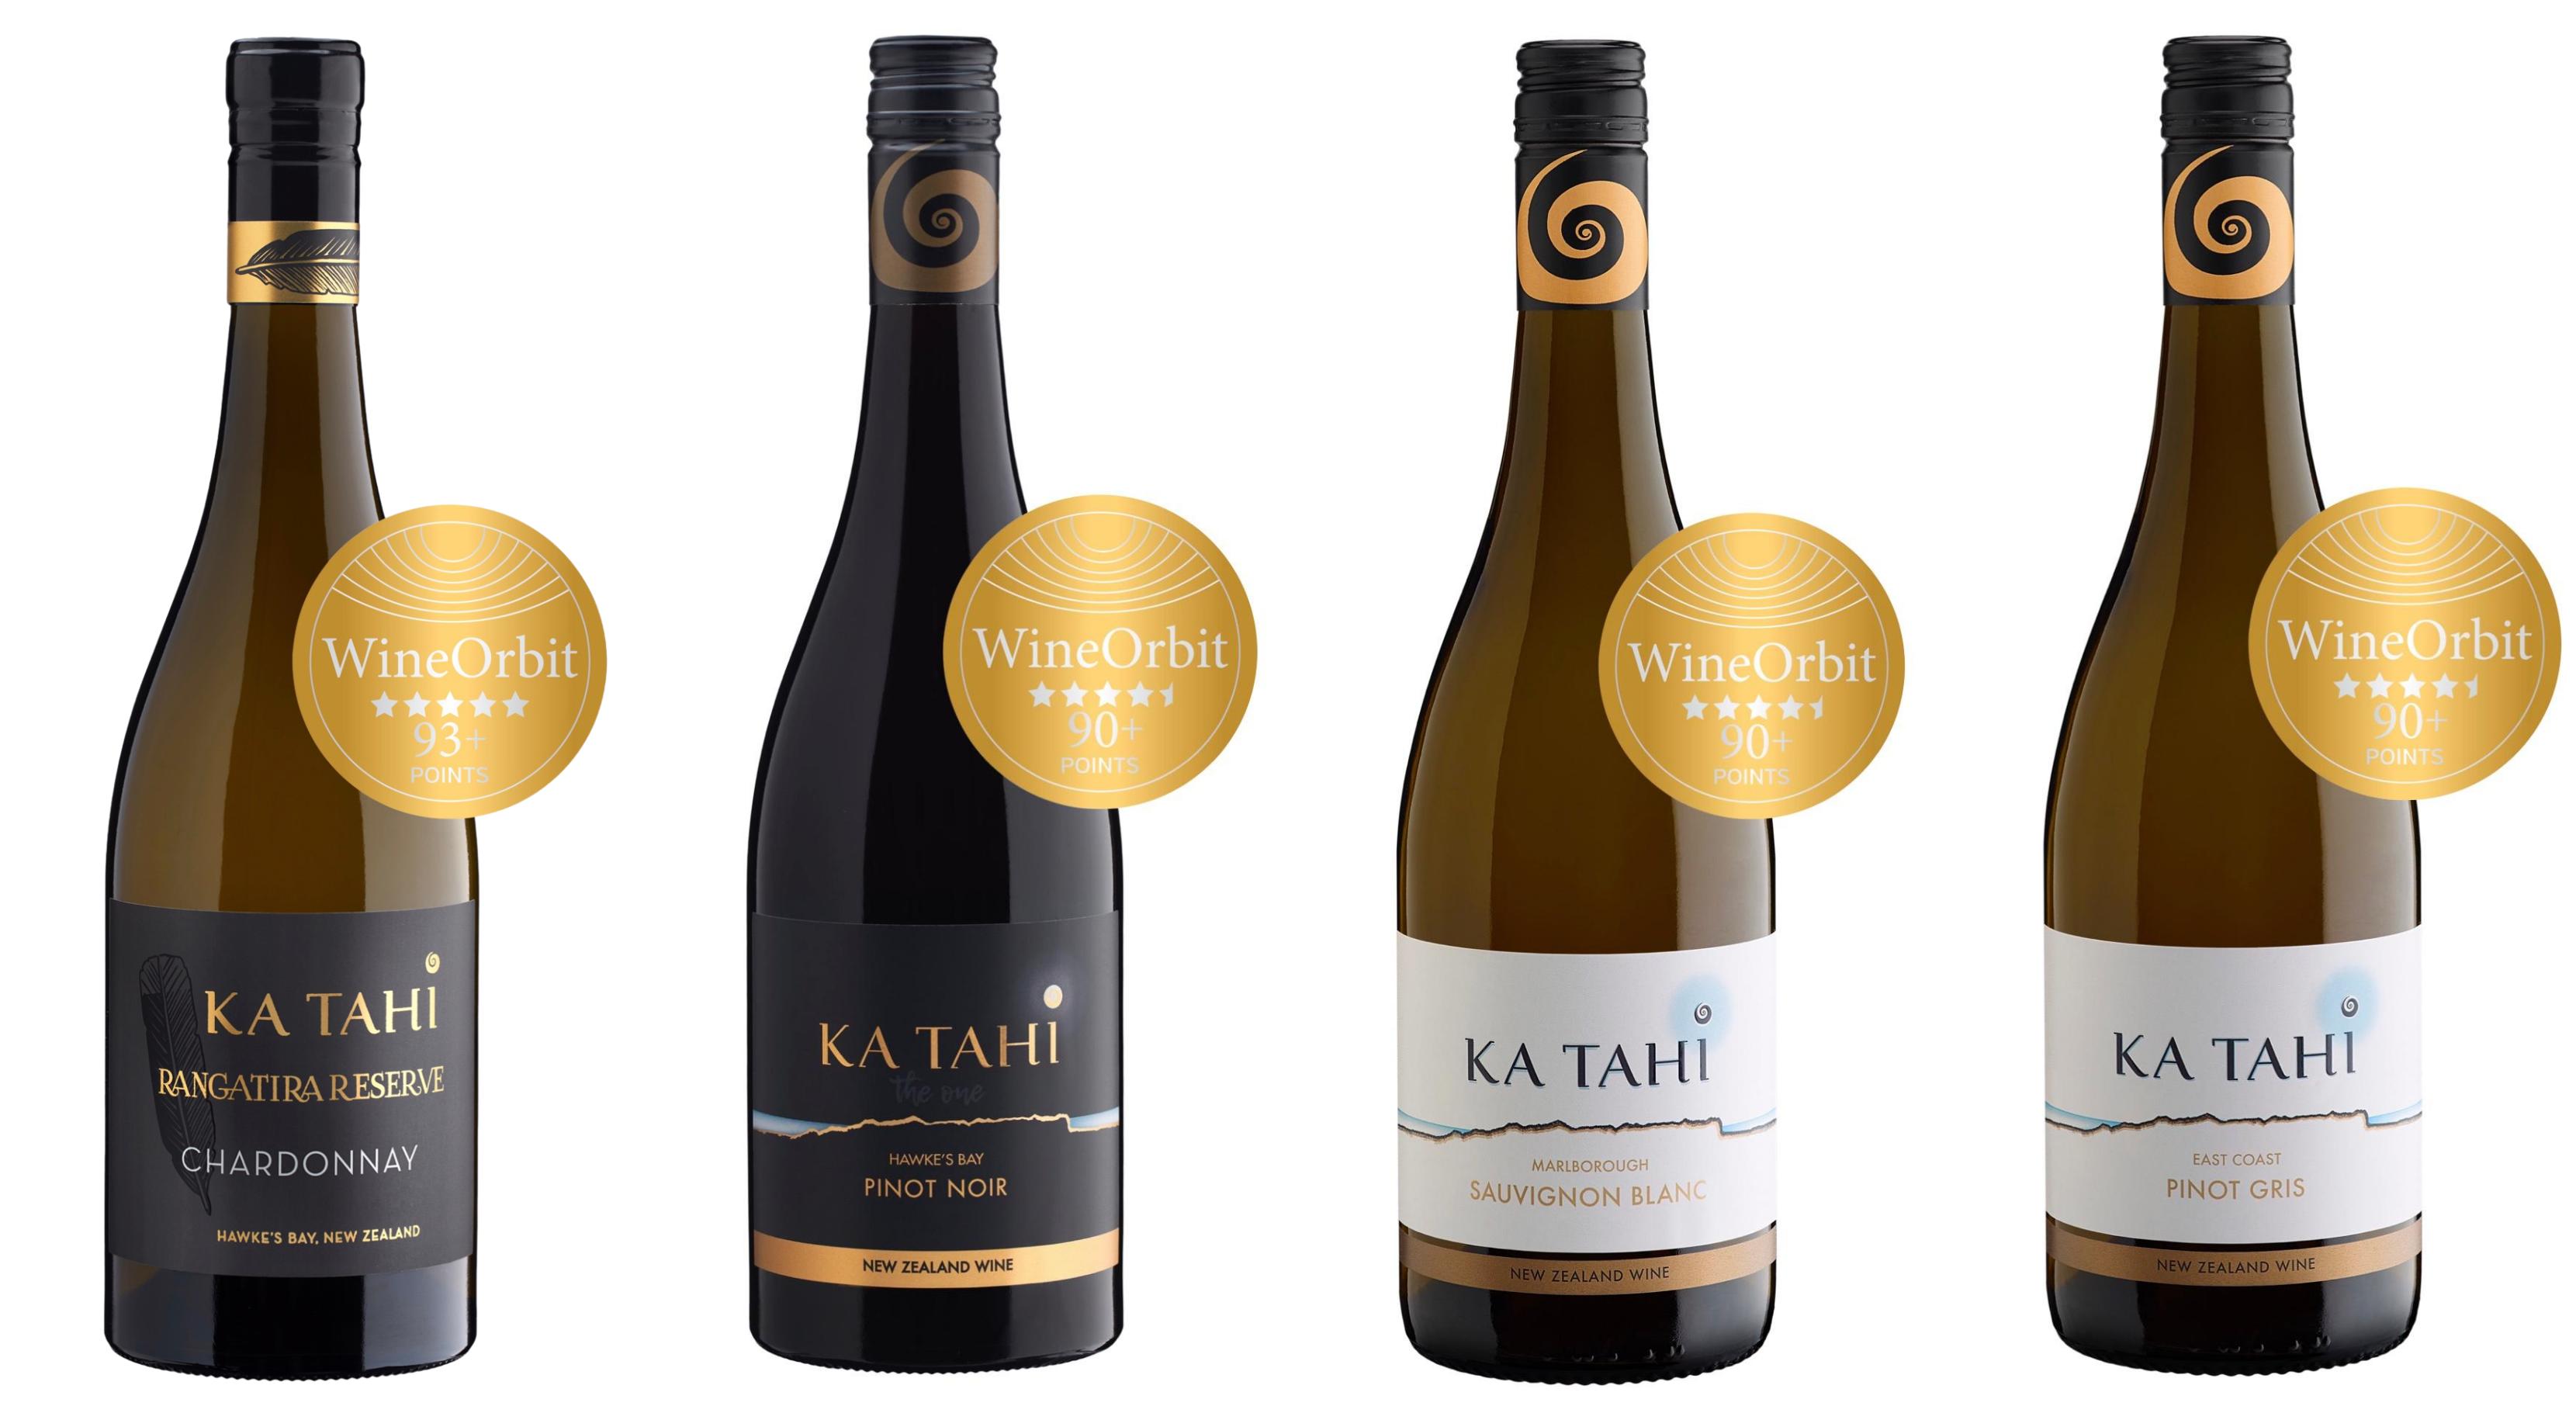 Latest Wine Orbit Awards